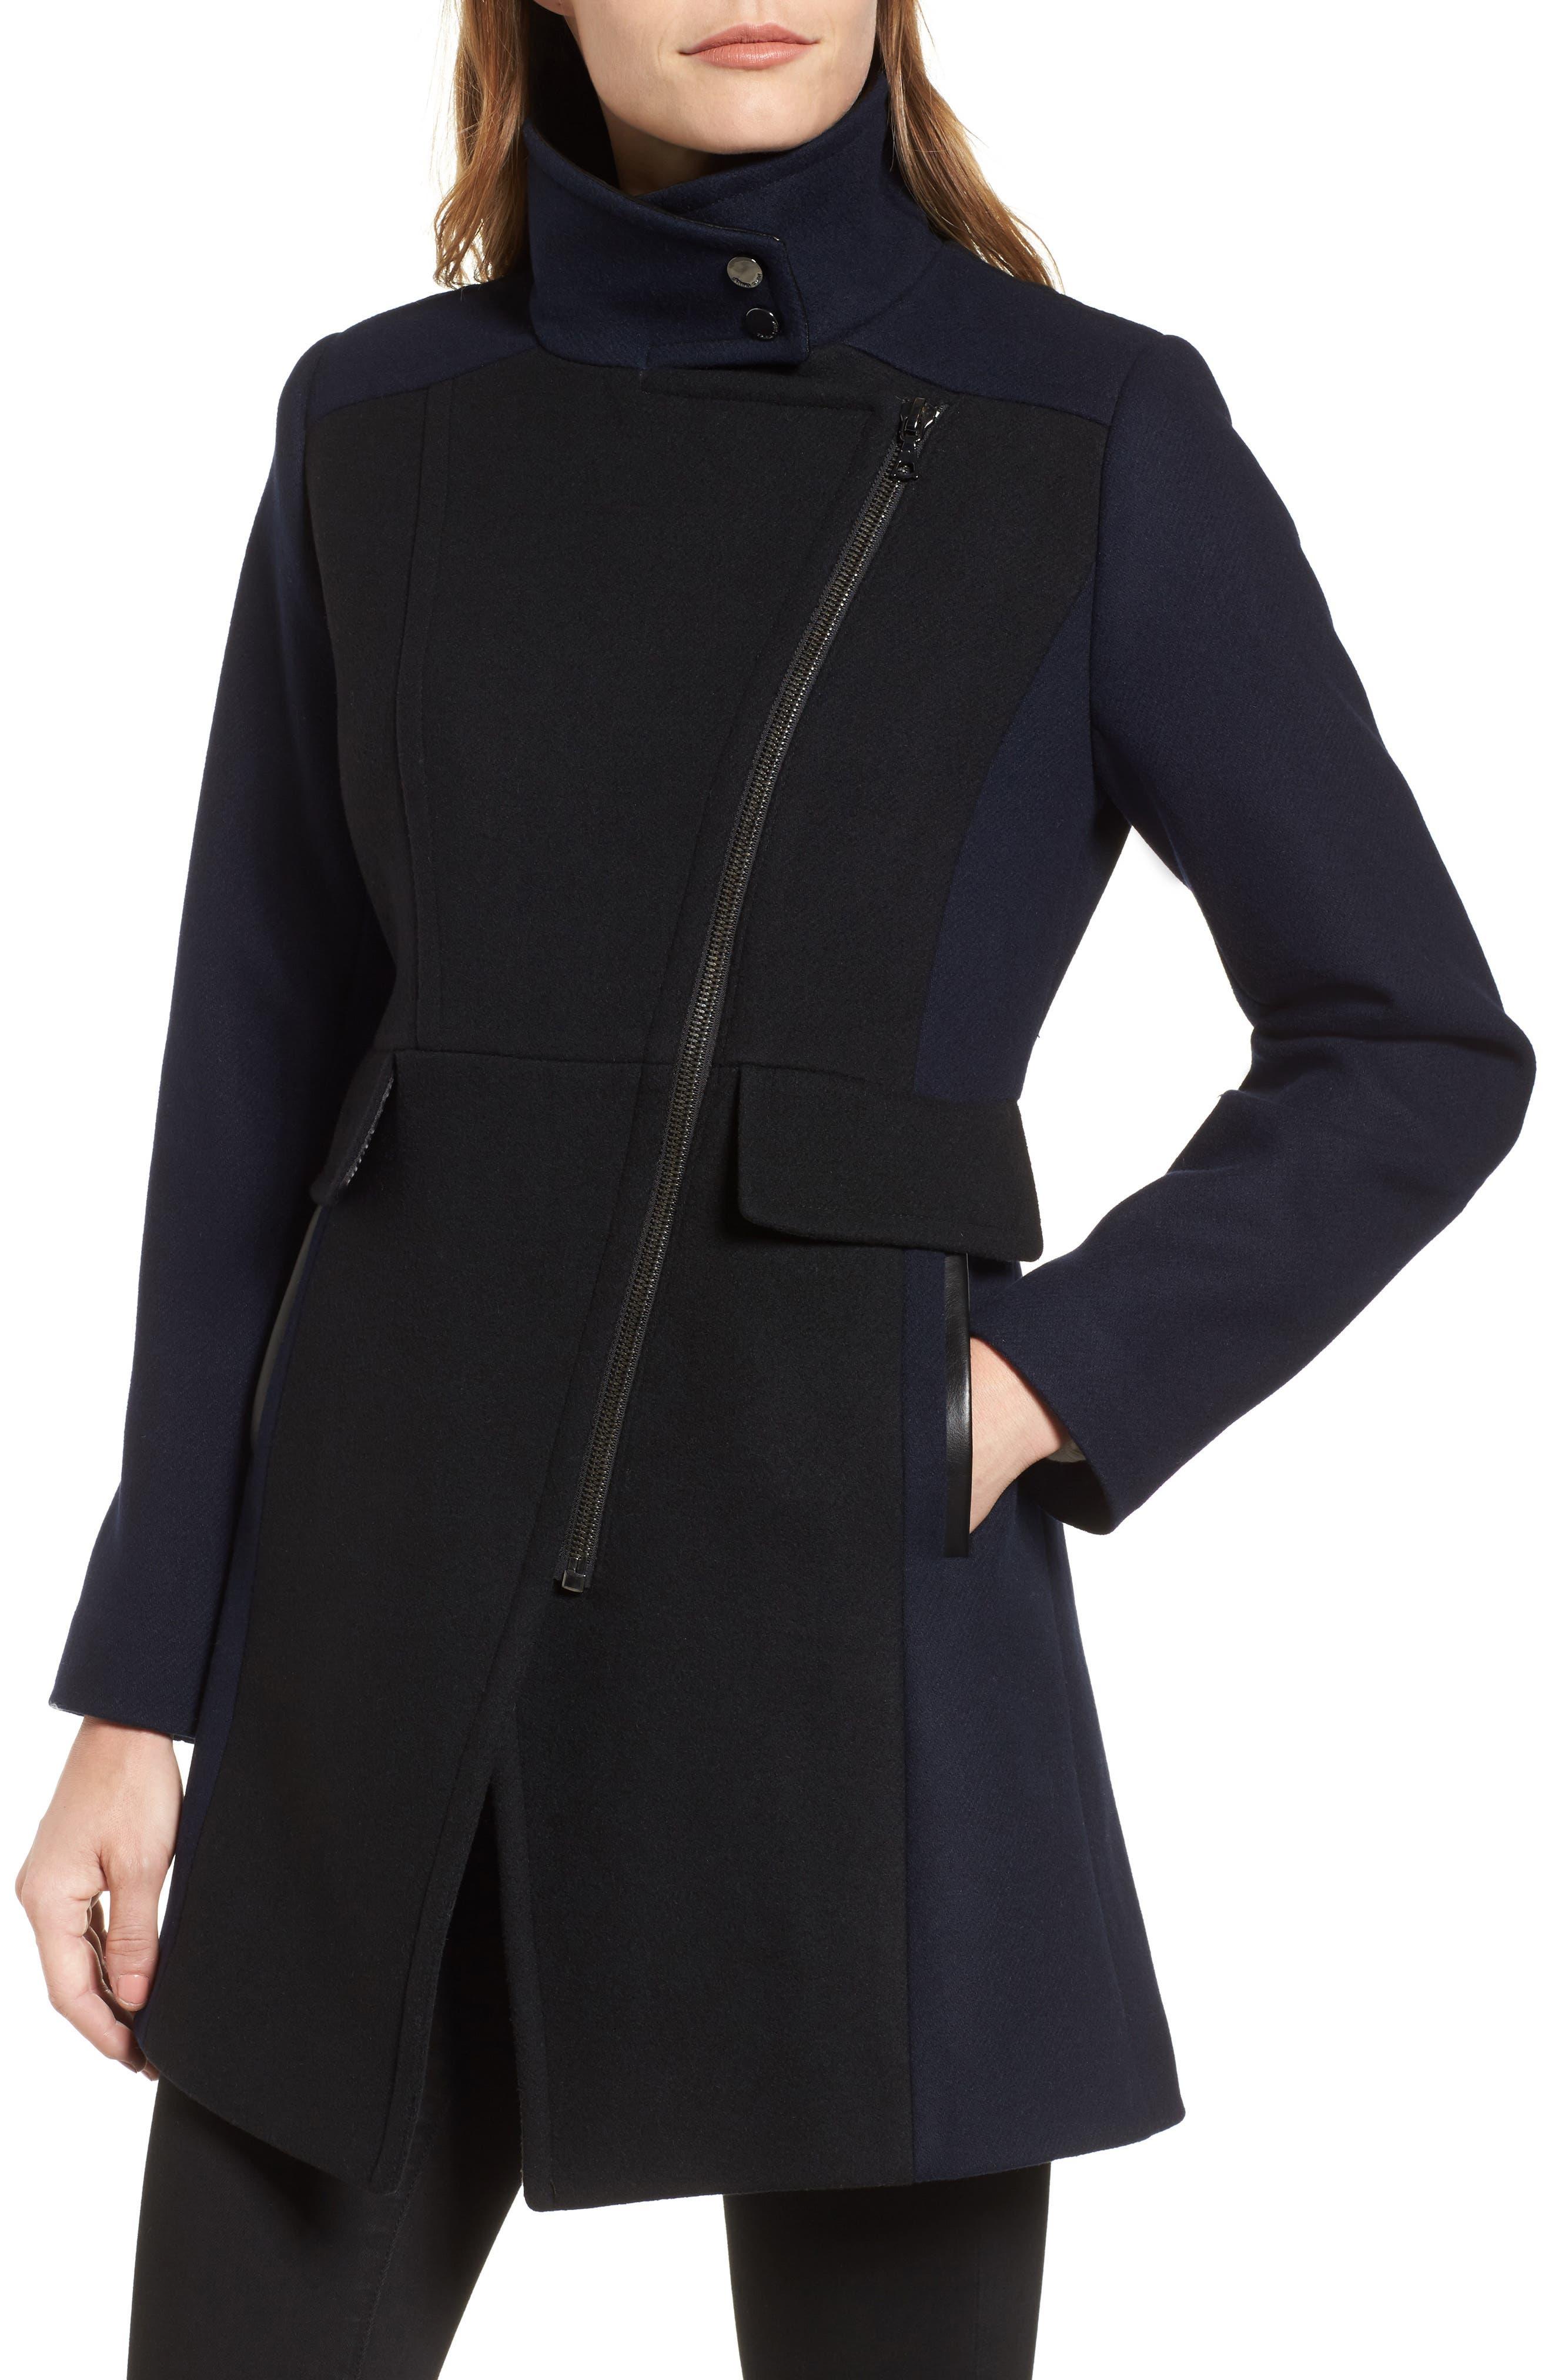 Eleanor Leather Trim Wool Blend Coat,                             Alternate thumbnail 4, color,                             Black/ Navy